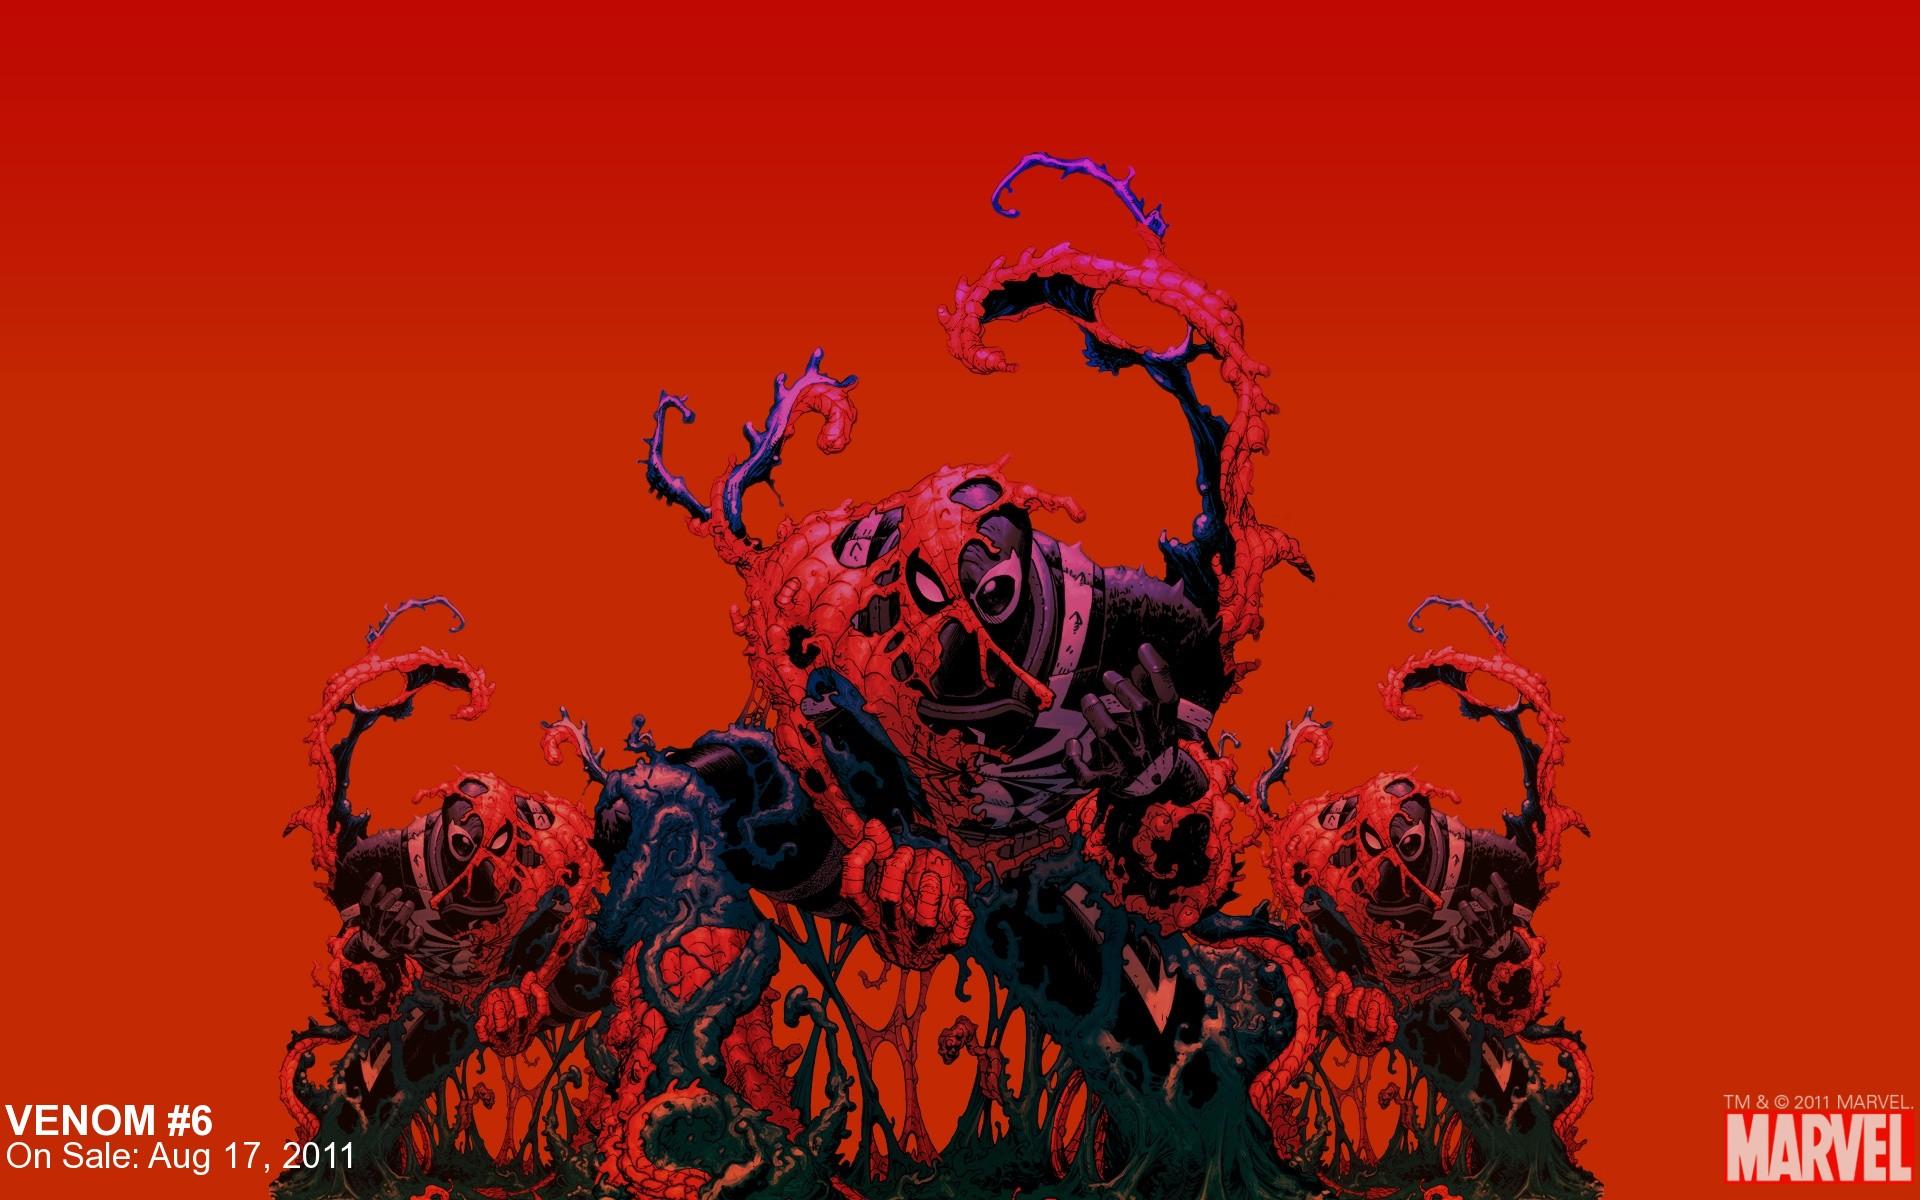 agent venom hd wallpaper background image 1920x1200